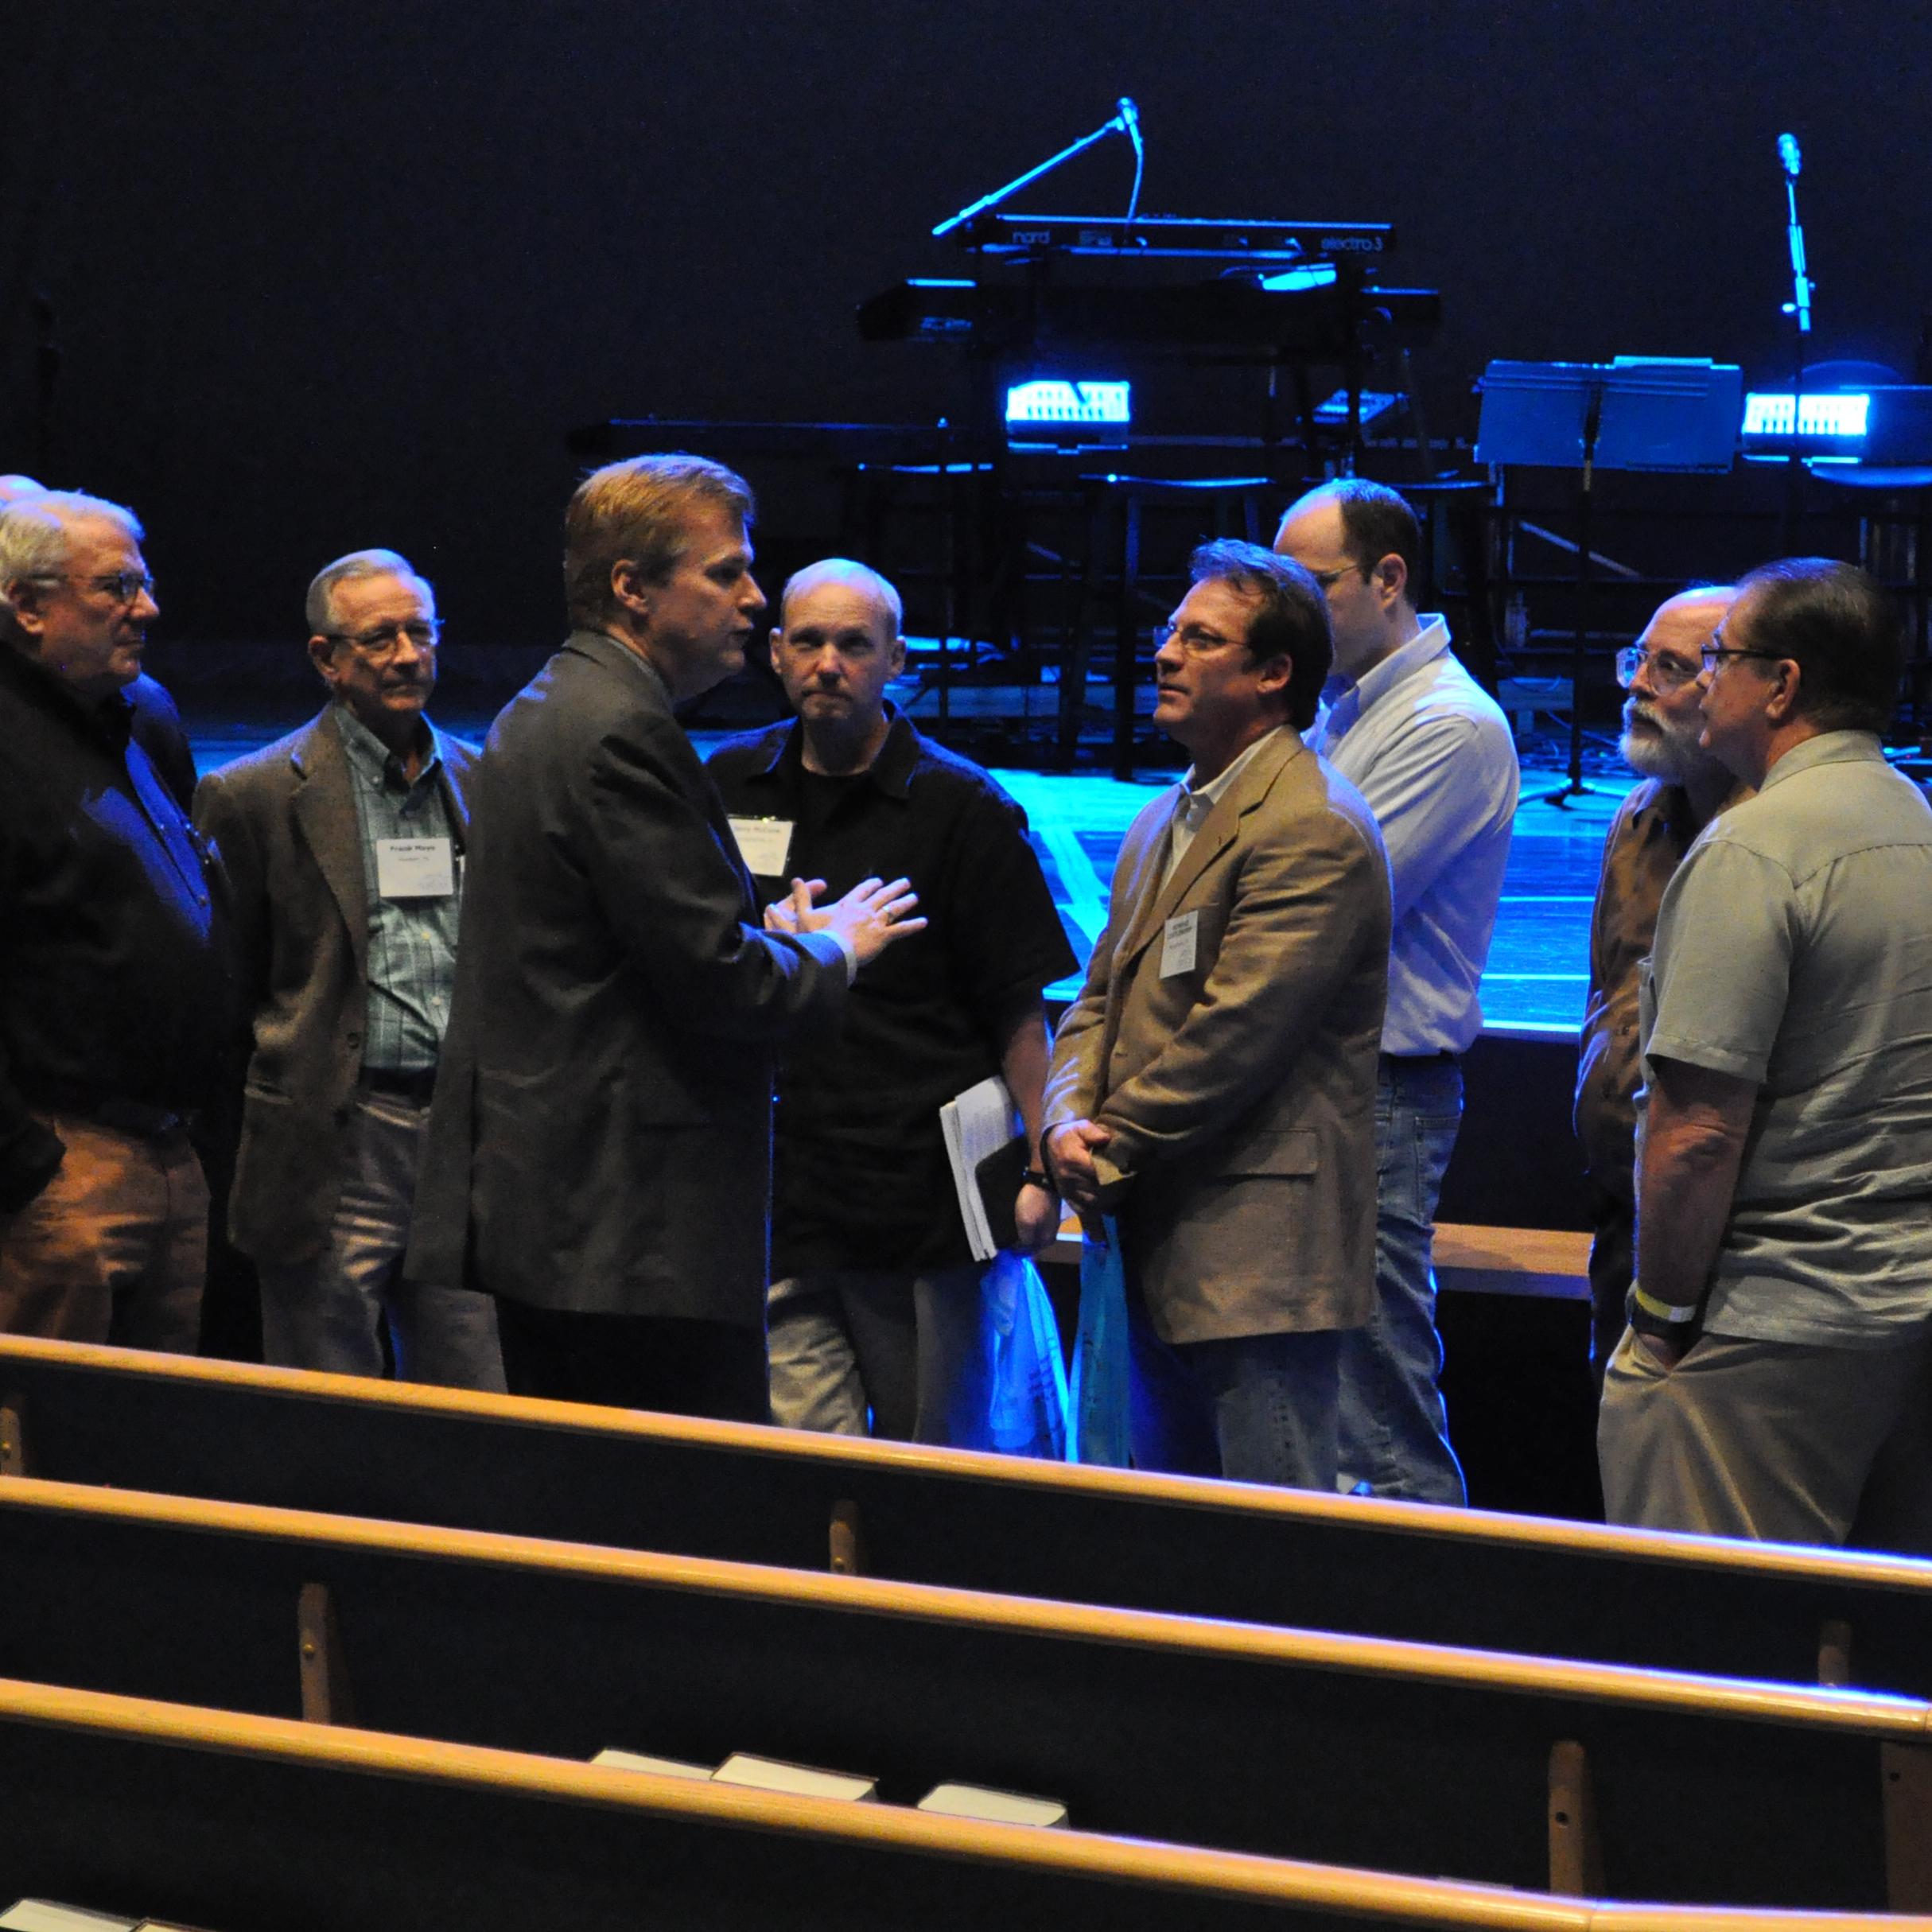 John Mark Reynolds Speaking with Attendees.jpg